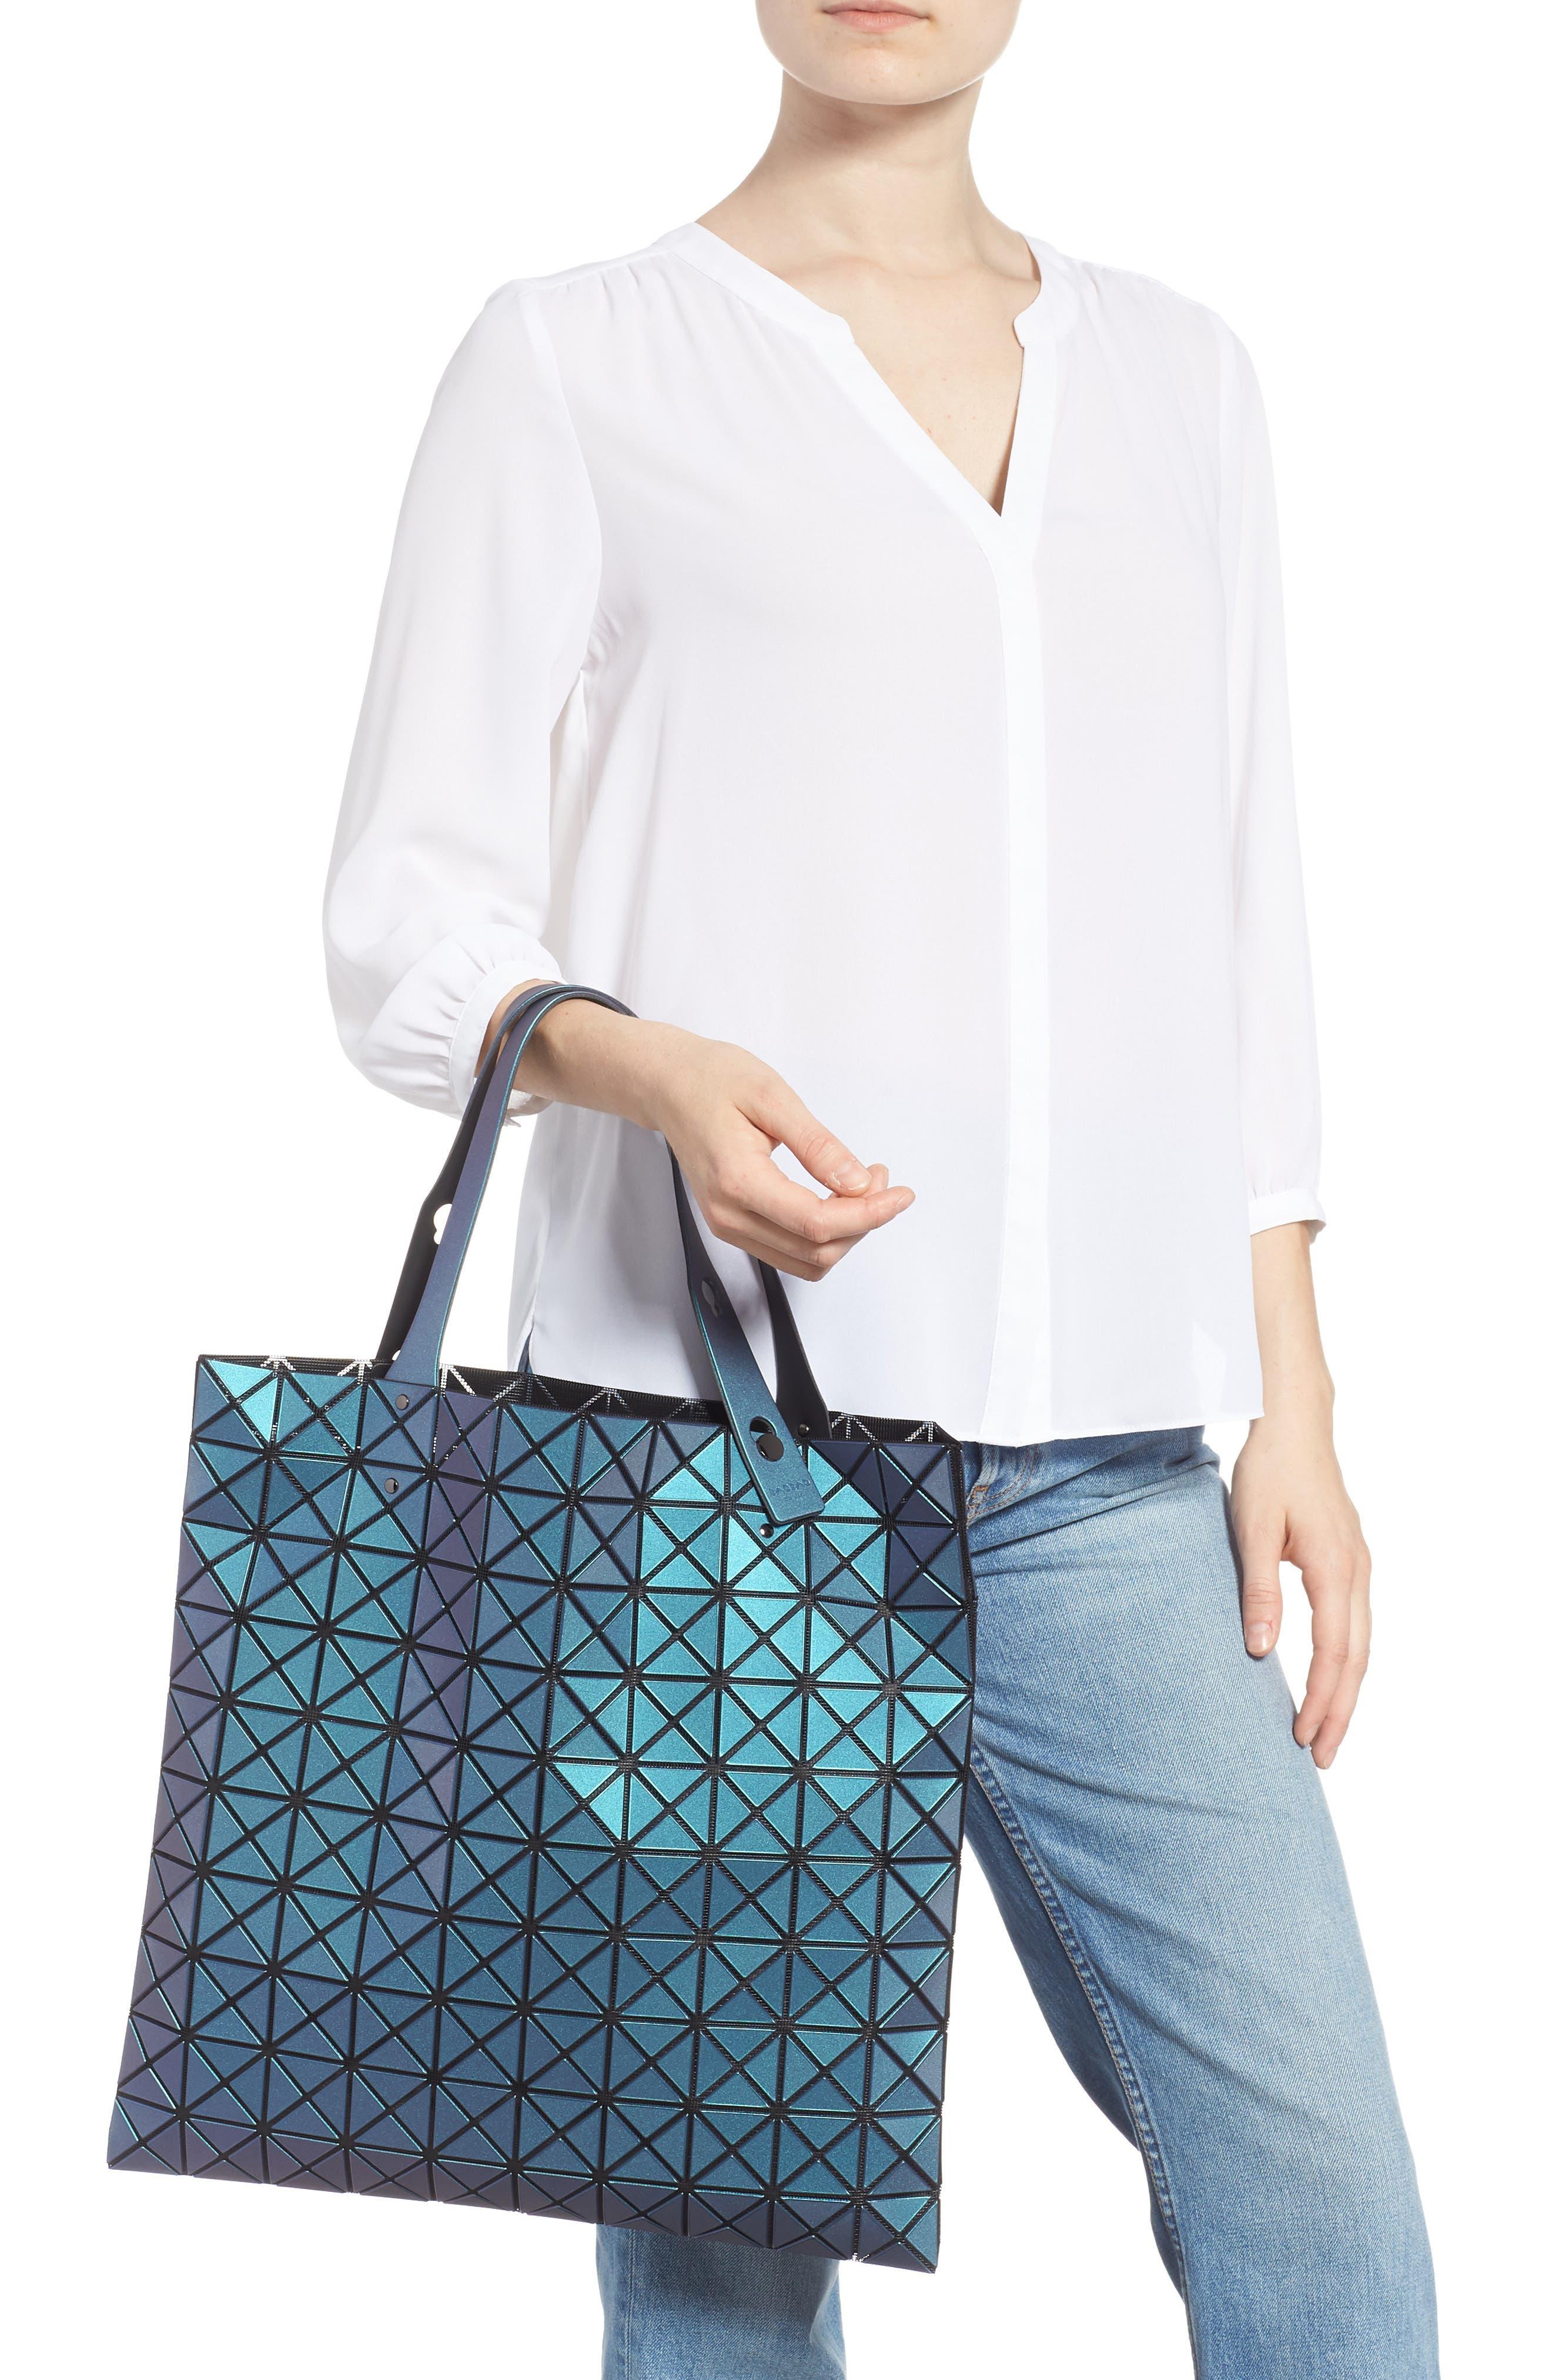 Prism Metallic Tote Bag,                             Alternate thumbnail 2, color,                             BLUE